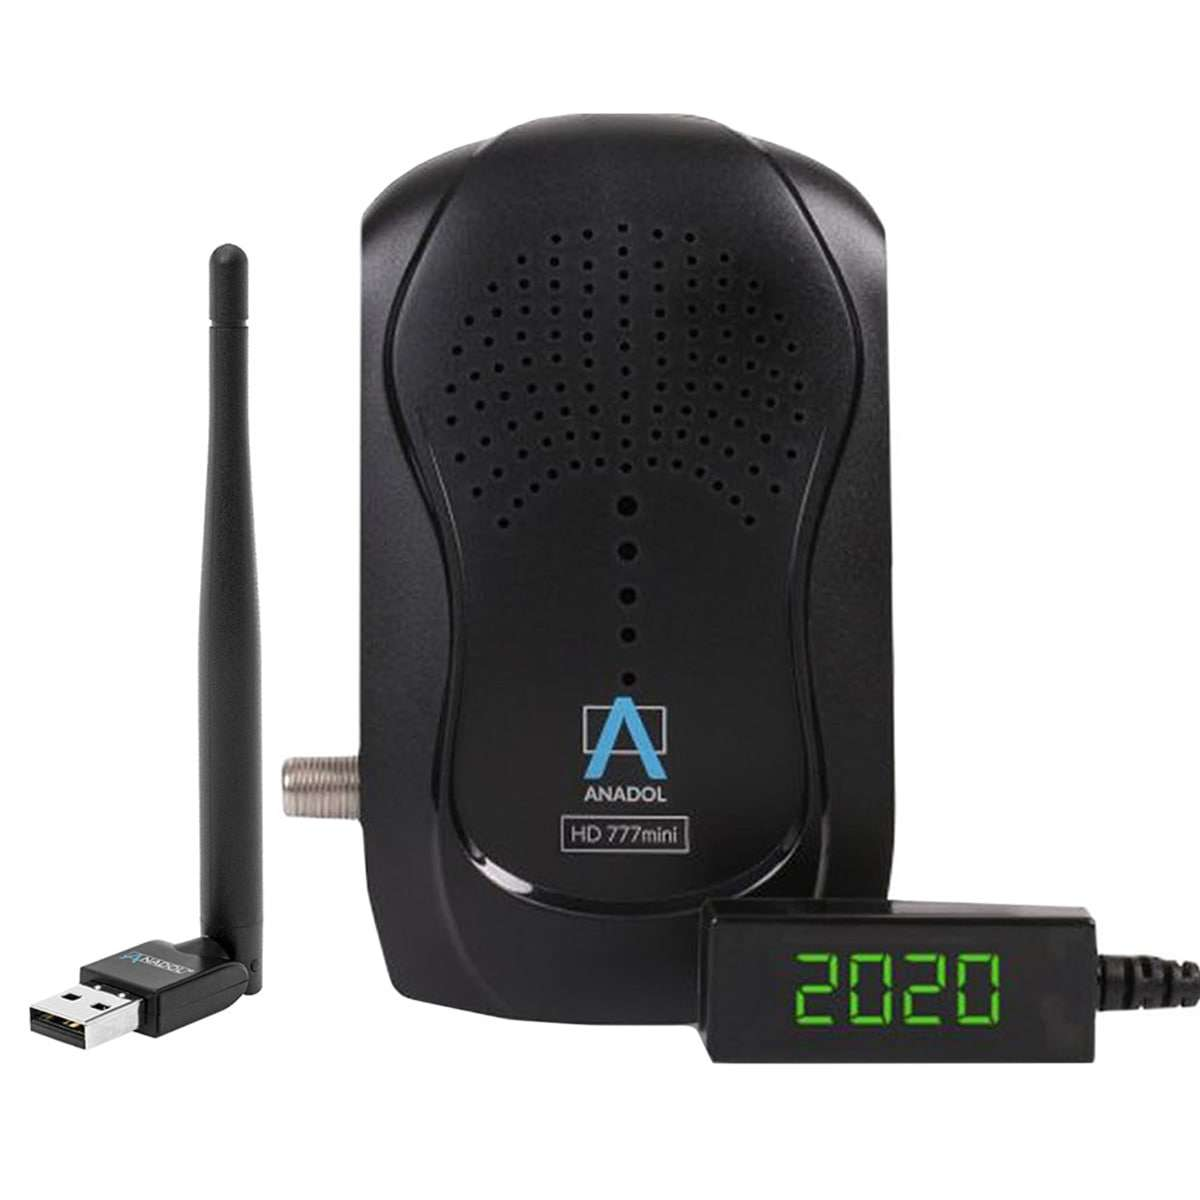 Anadol HD 777 Mini Full HD 1080p HDMI USB PVR Sat Receiver mit Wlan Stick Schwarz RECANA013W